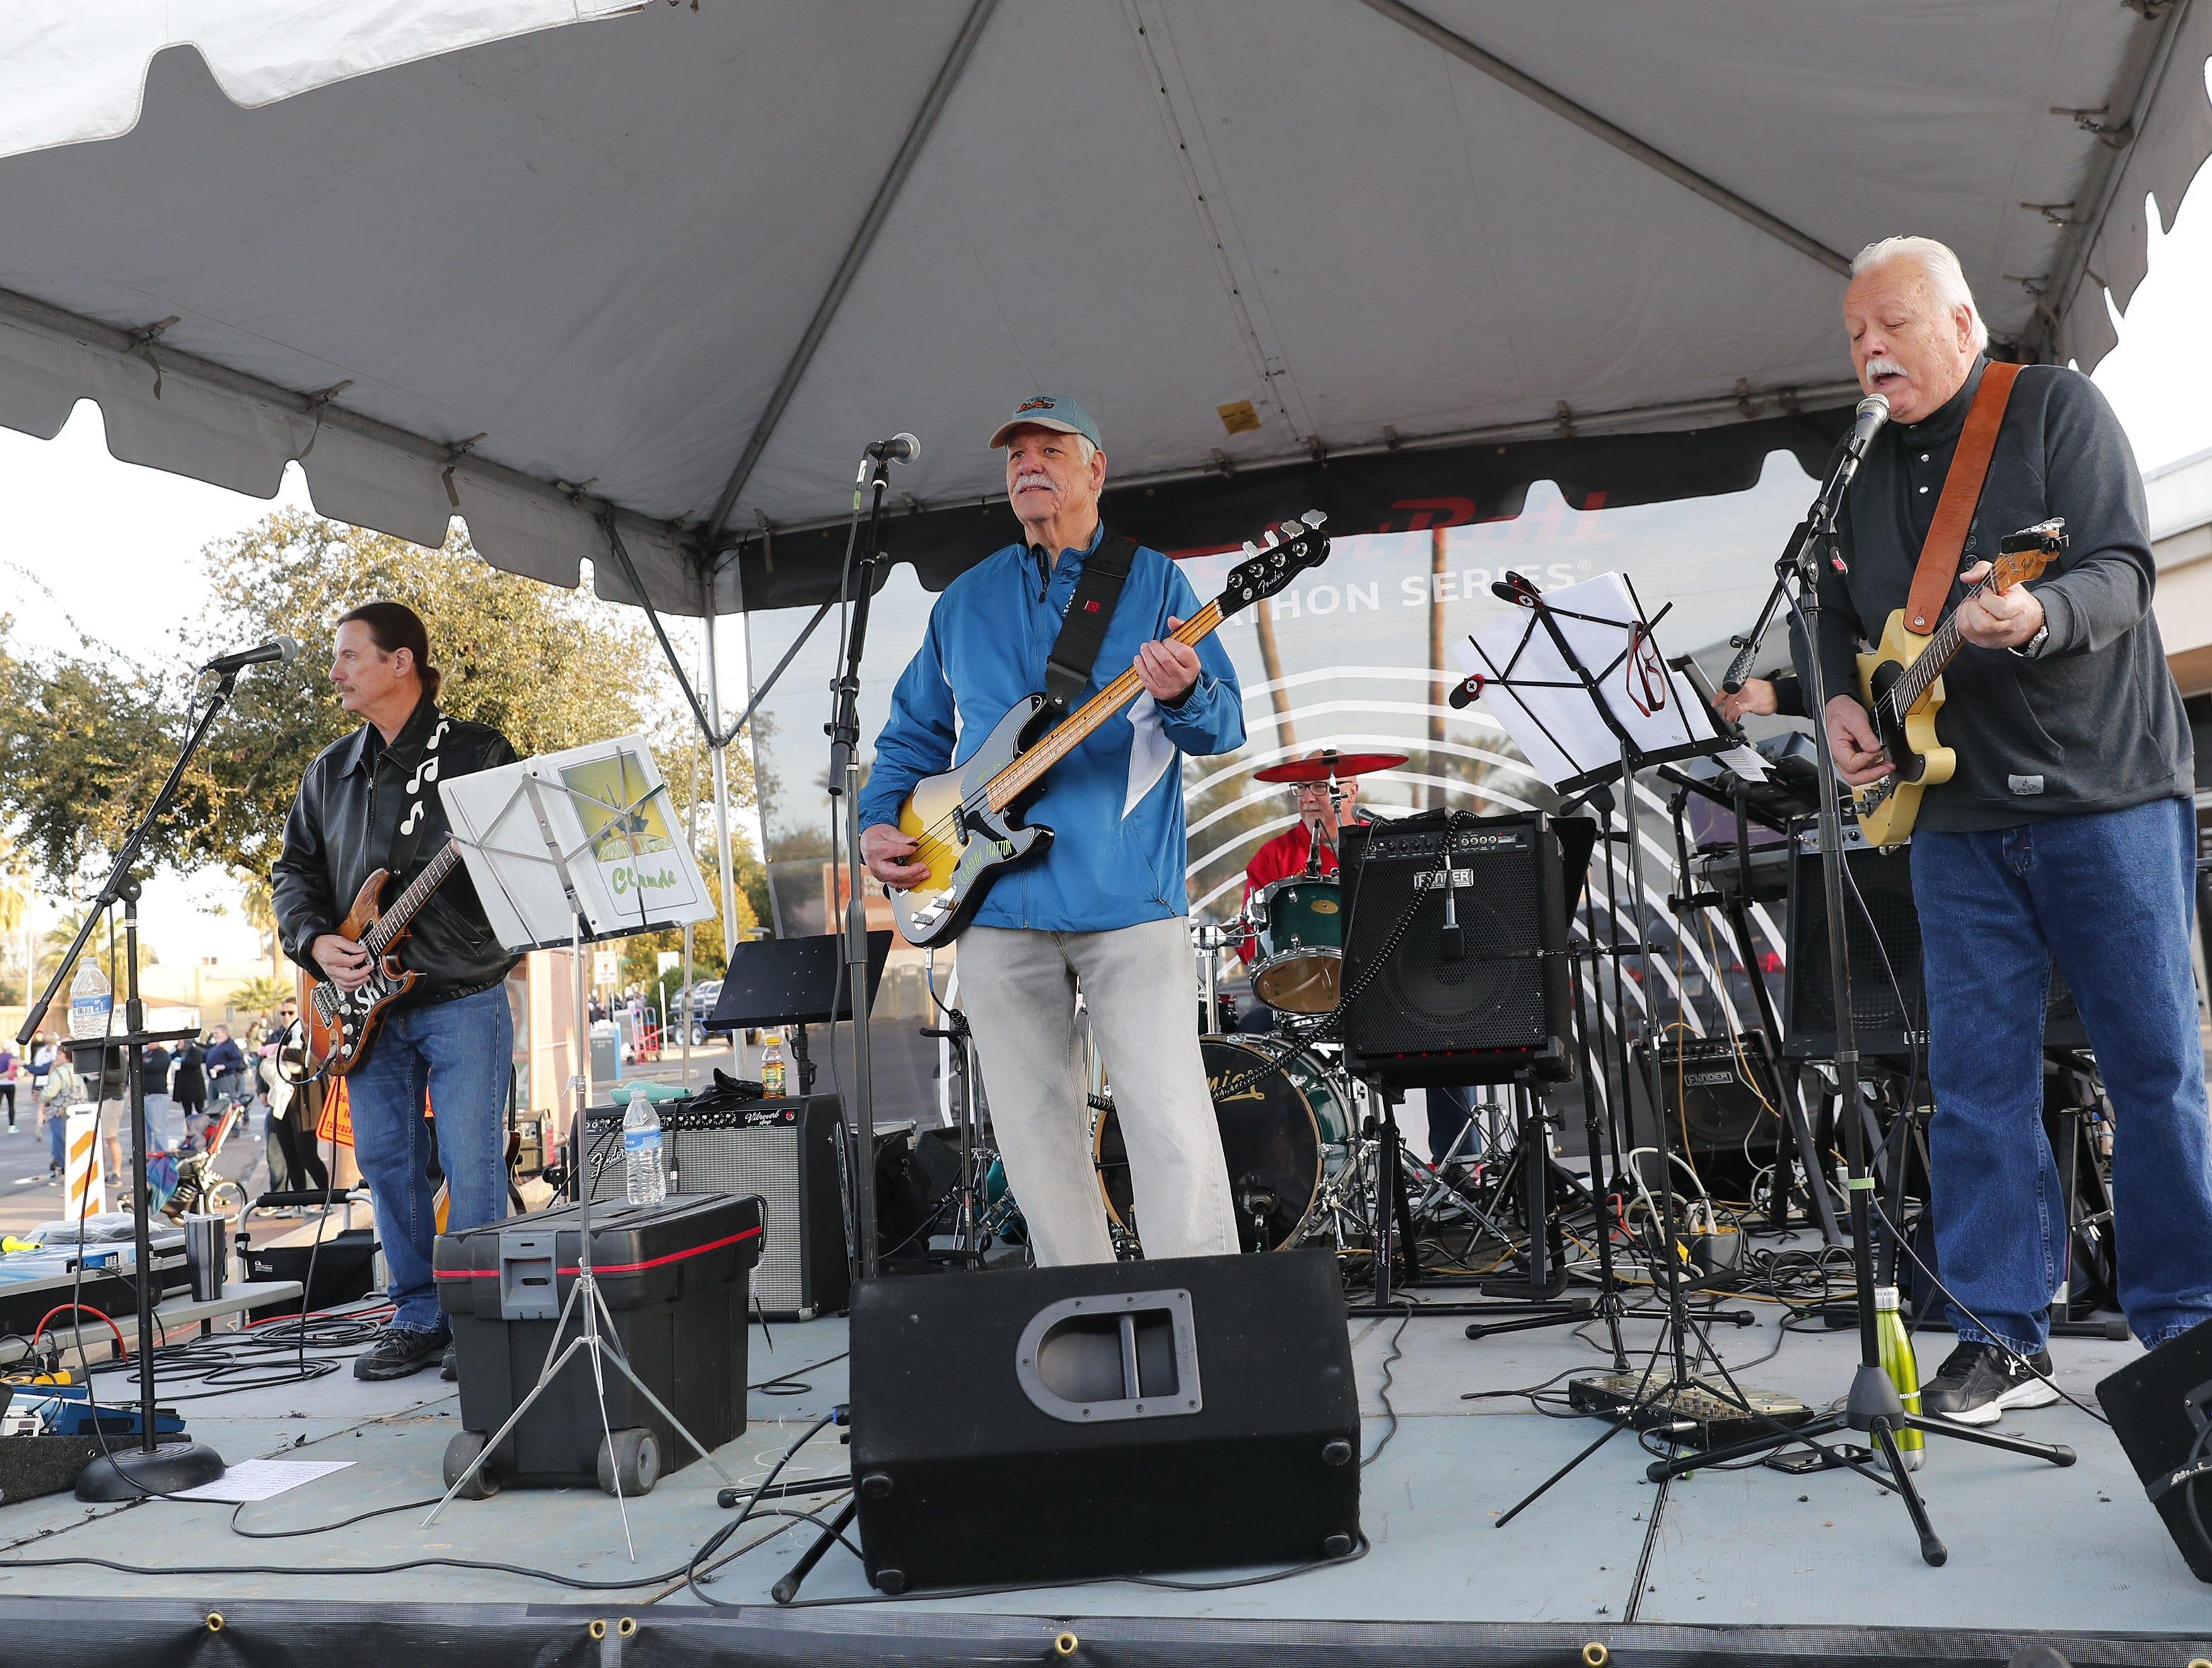 The Screamin' Javelinas perform during the Rock 'n' Roll Marathon in Phoenix, Jan. 20, 2019.